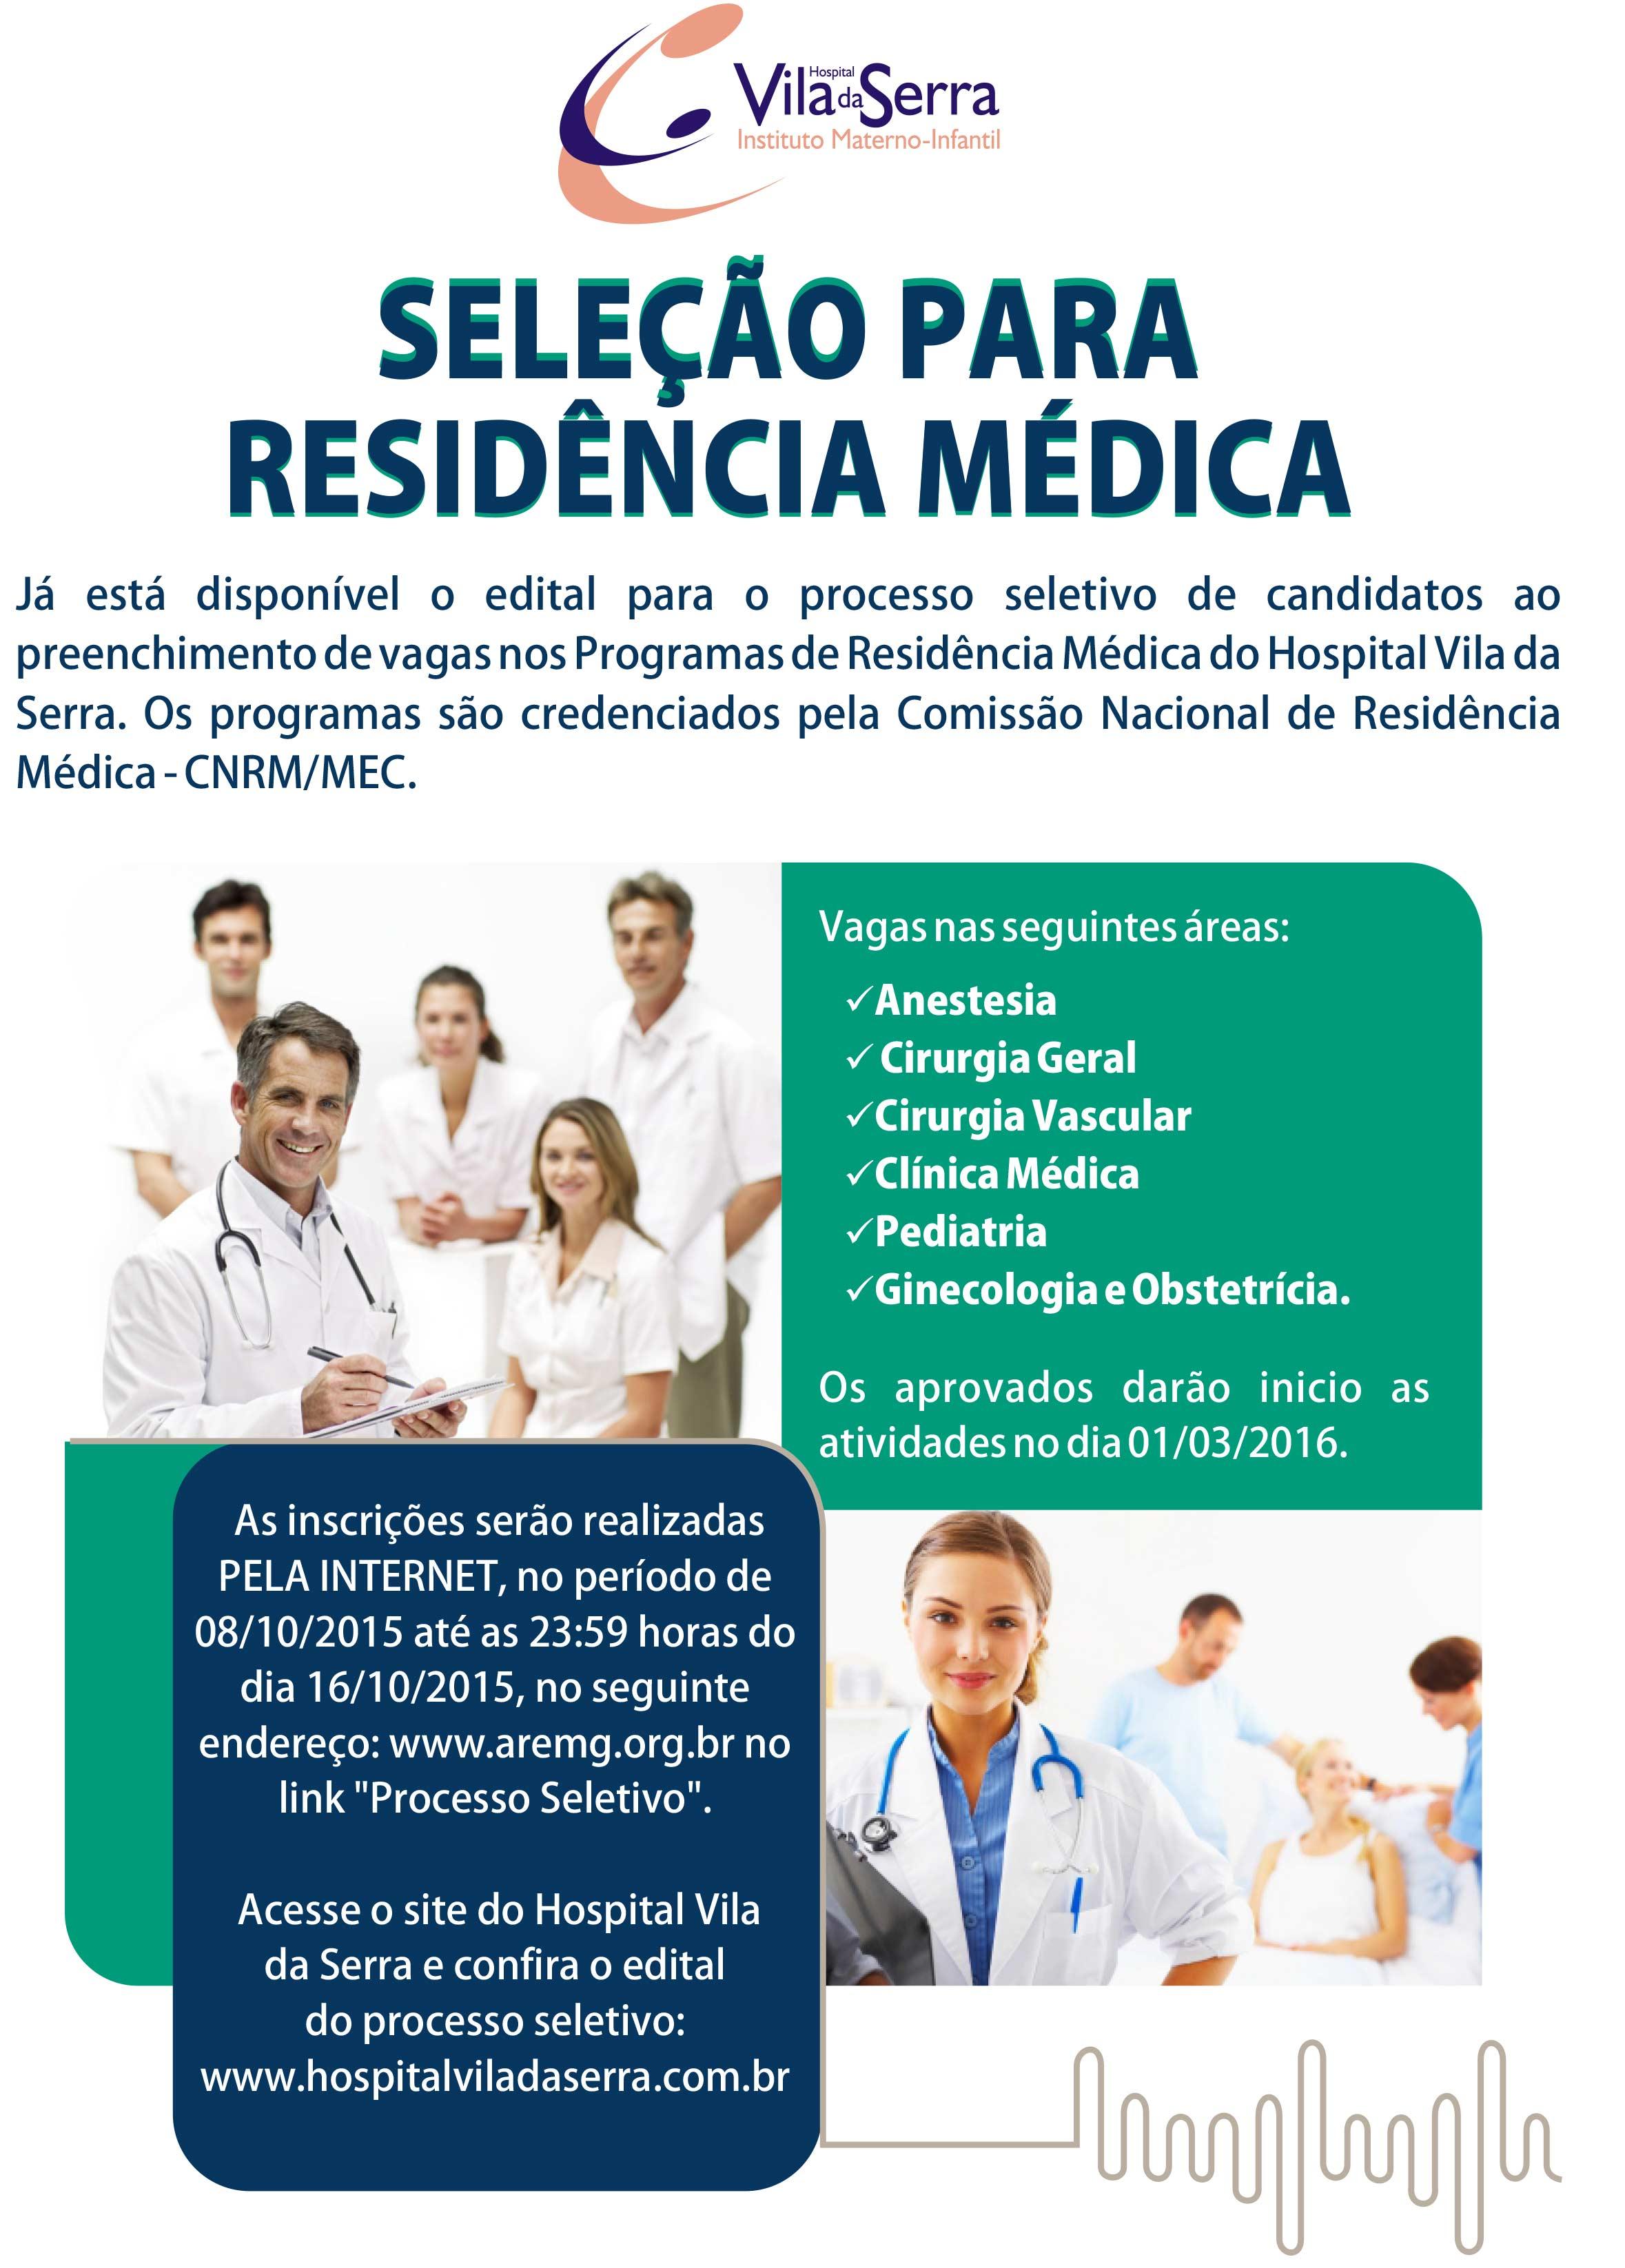 processo-seletivo-de-residencia-medica-hvs